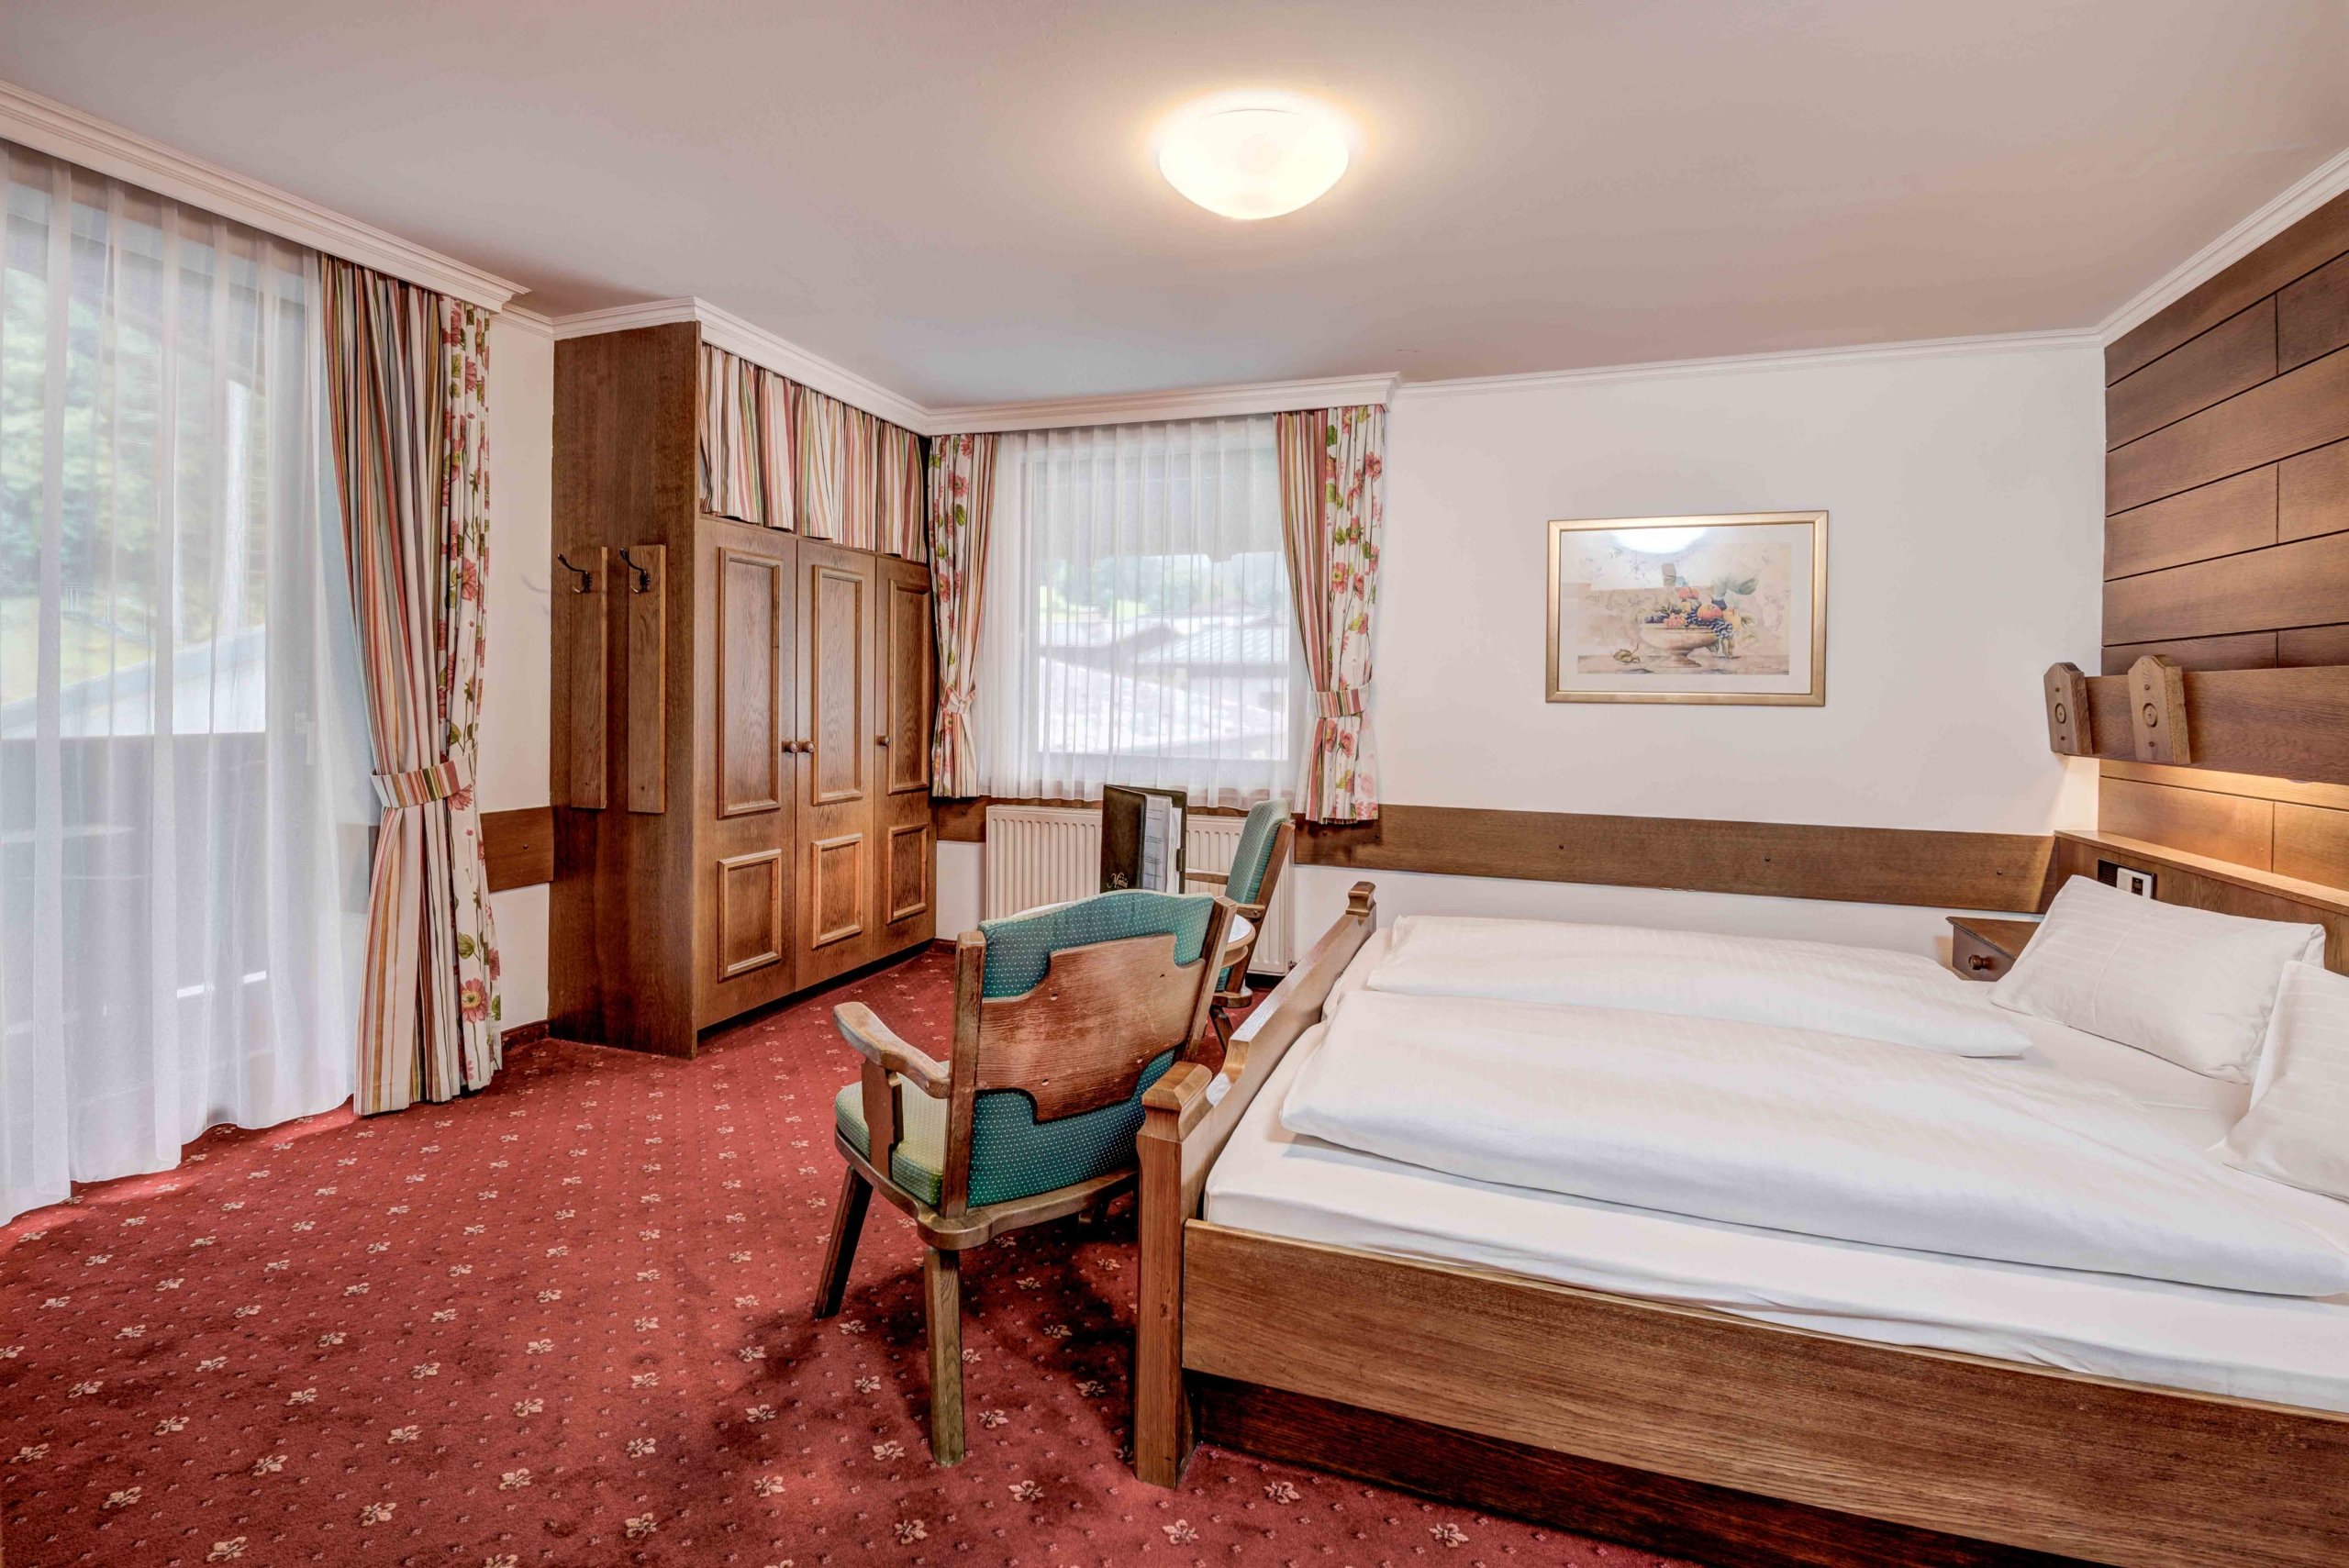 Hotel Martini Doppelzimmer mit Balkon